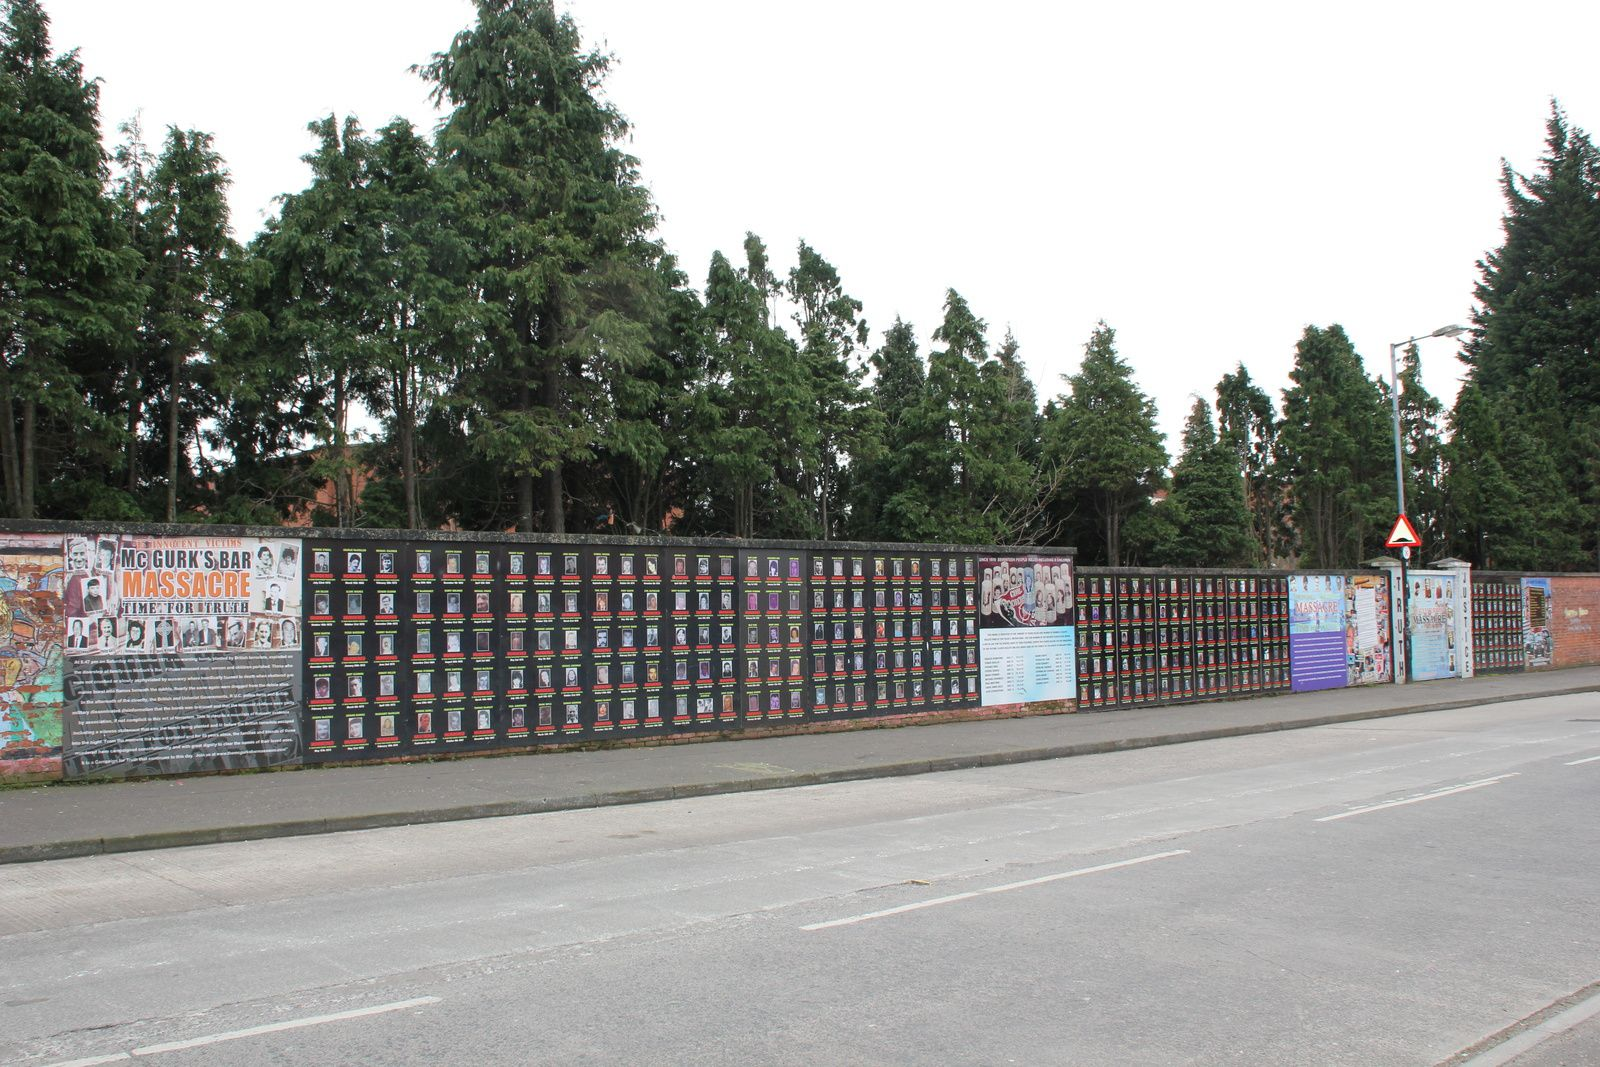 471) Beechmount Avenue, West Belfast